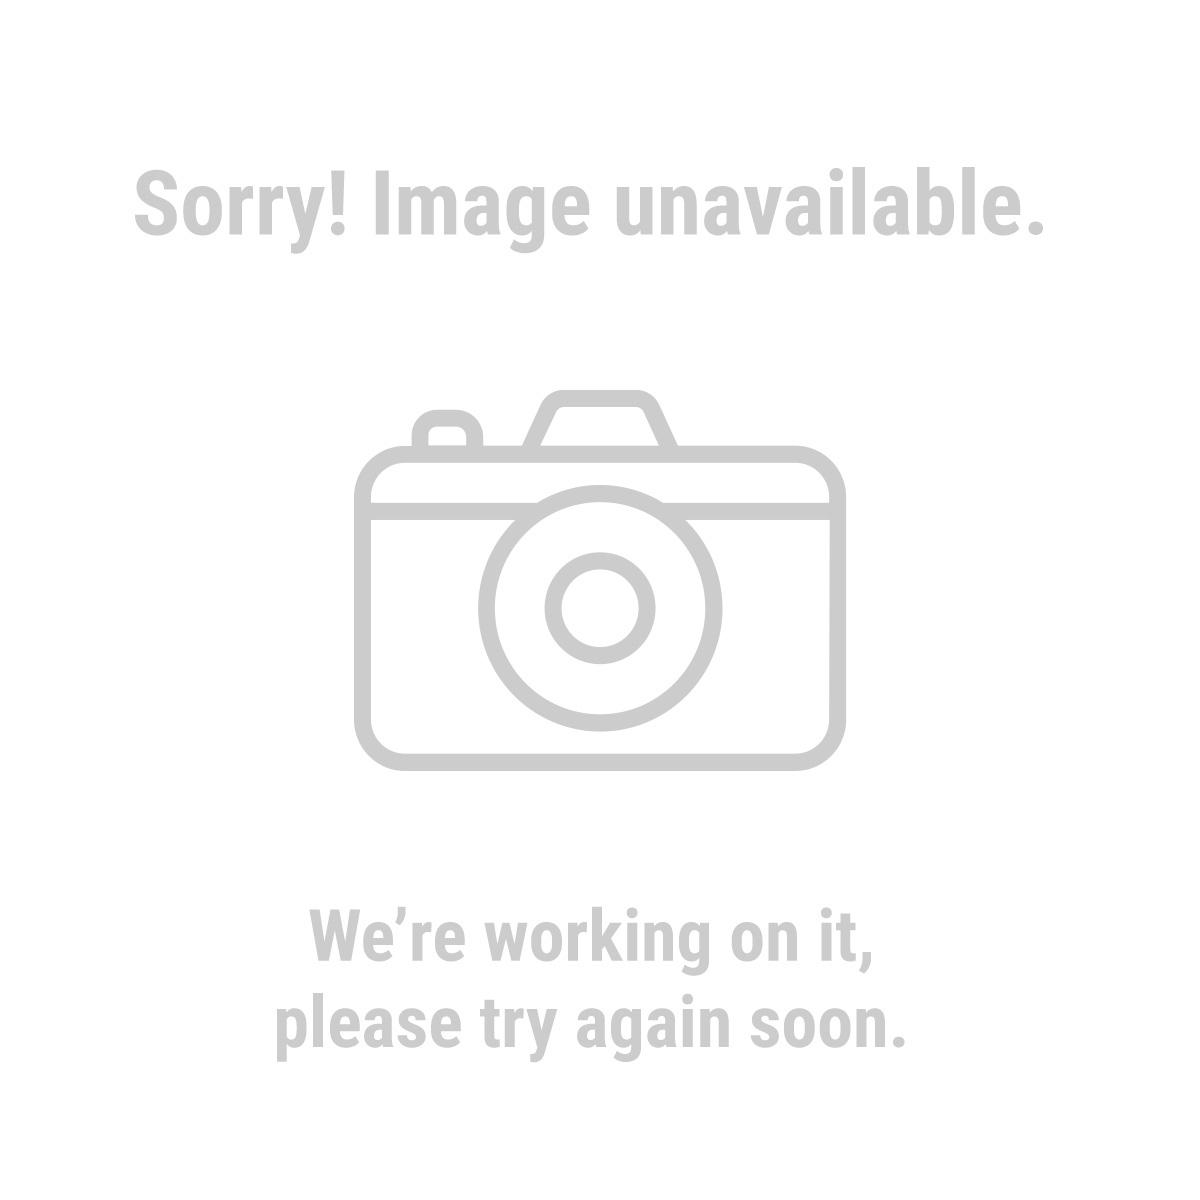 Cen-Tech 94181 Cable Tracker